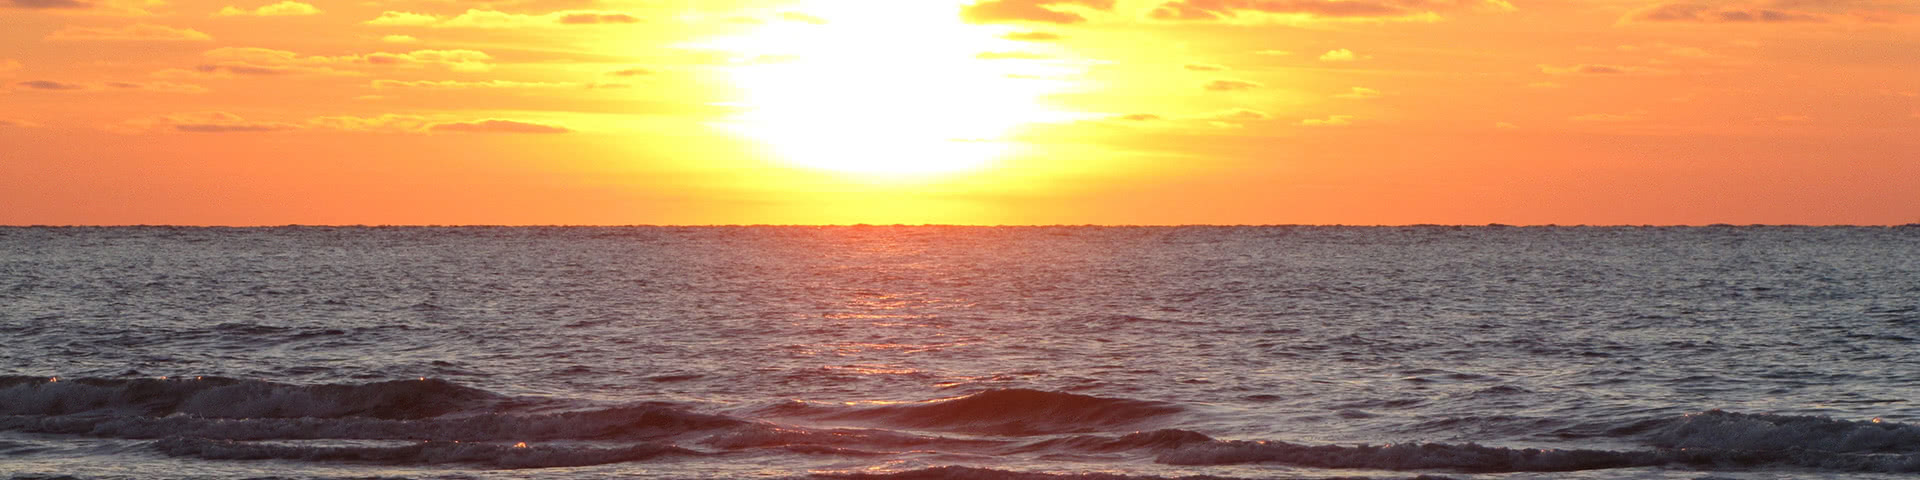 Sonnenuntergang am Meer auf Norderney